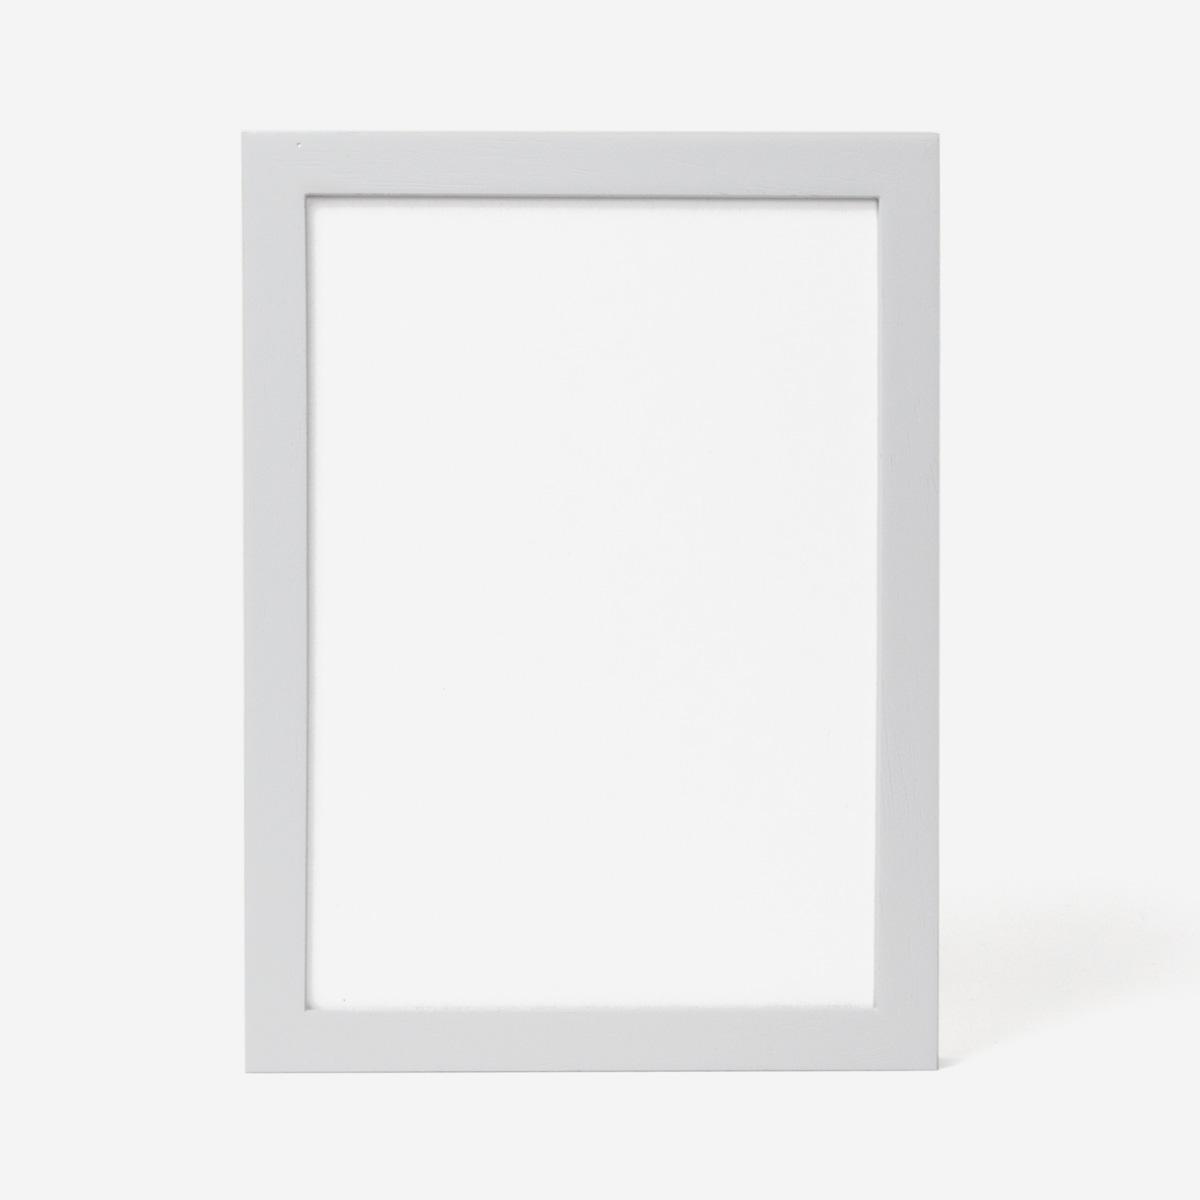 rikiki grafik produkt bilderrahmen lichtgrau 15 21 cm. Black Bedroom Furniture Sets. Home Design Ideas